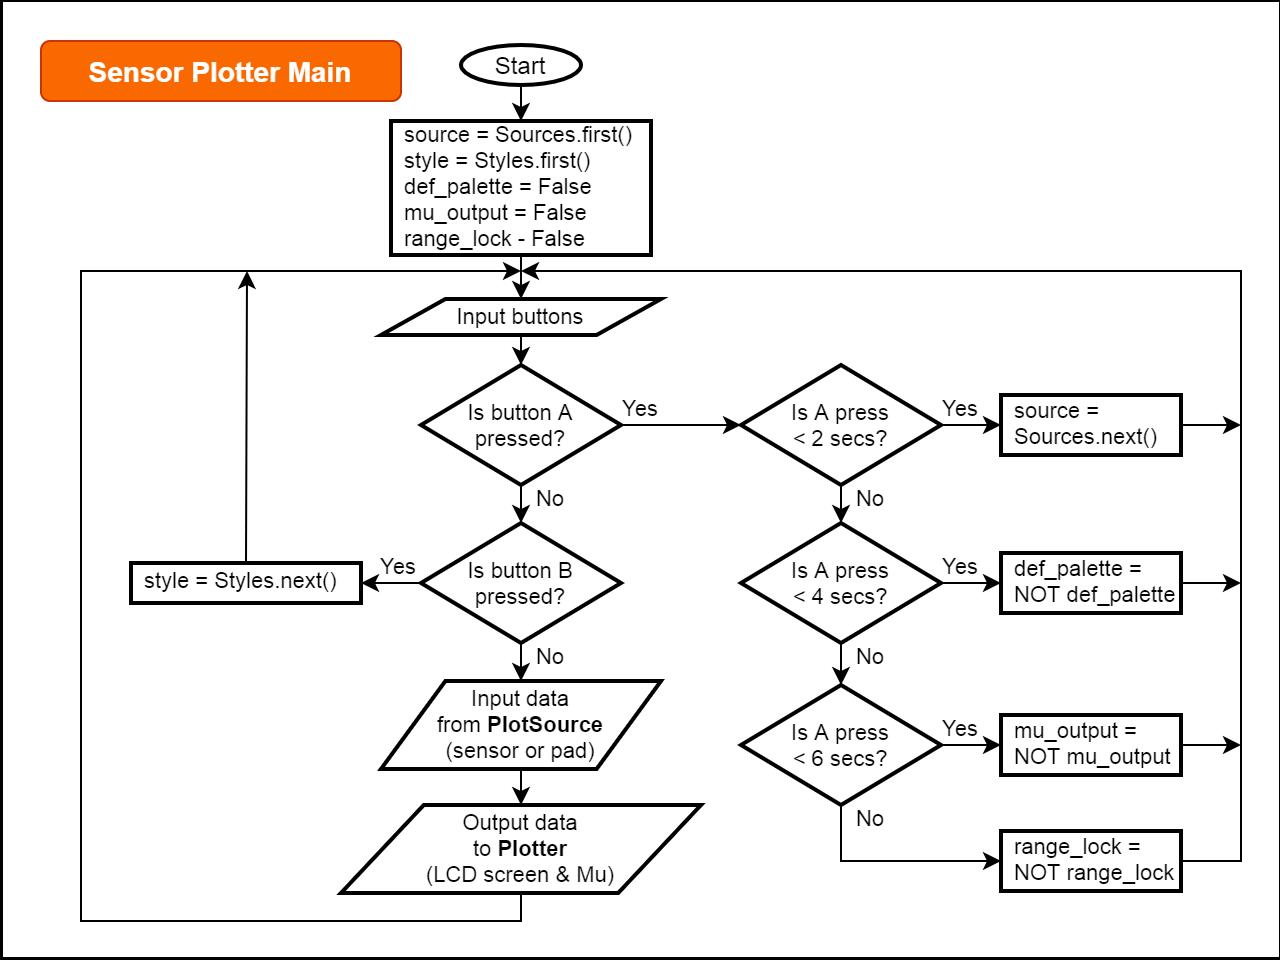 sensors_clue-sensor-plotter-main-flowchart-v3.png